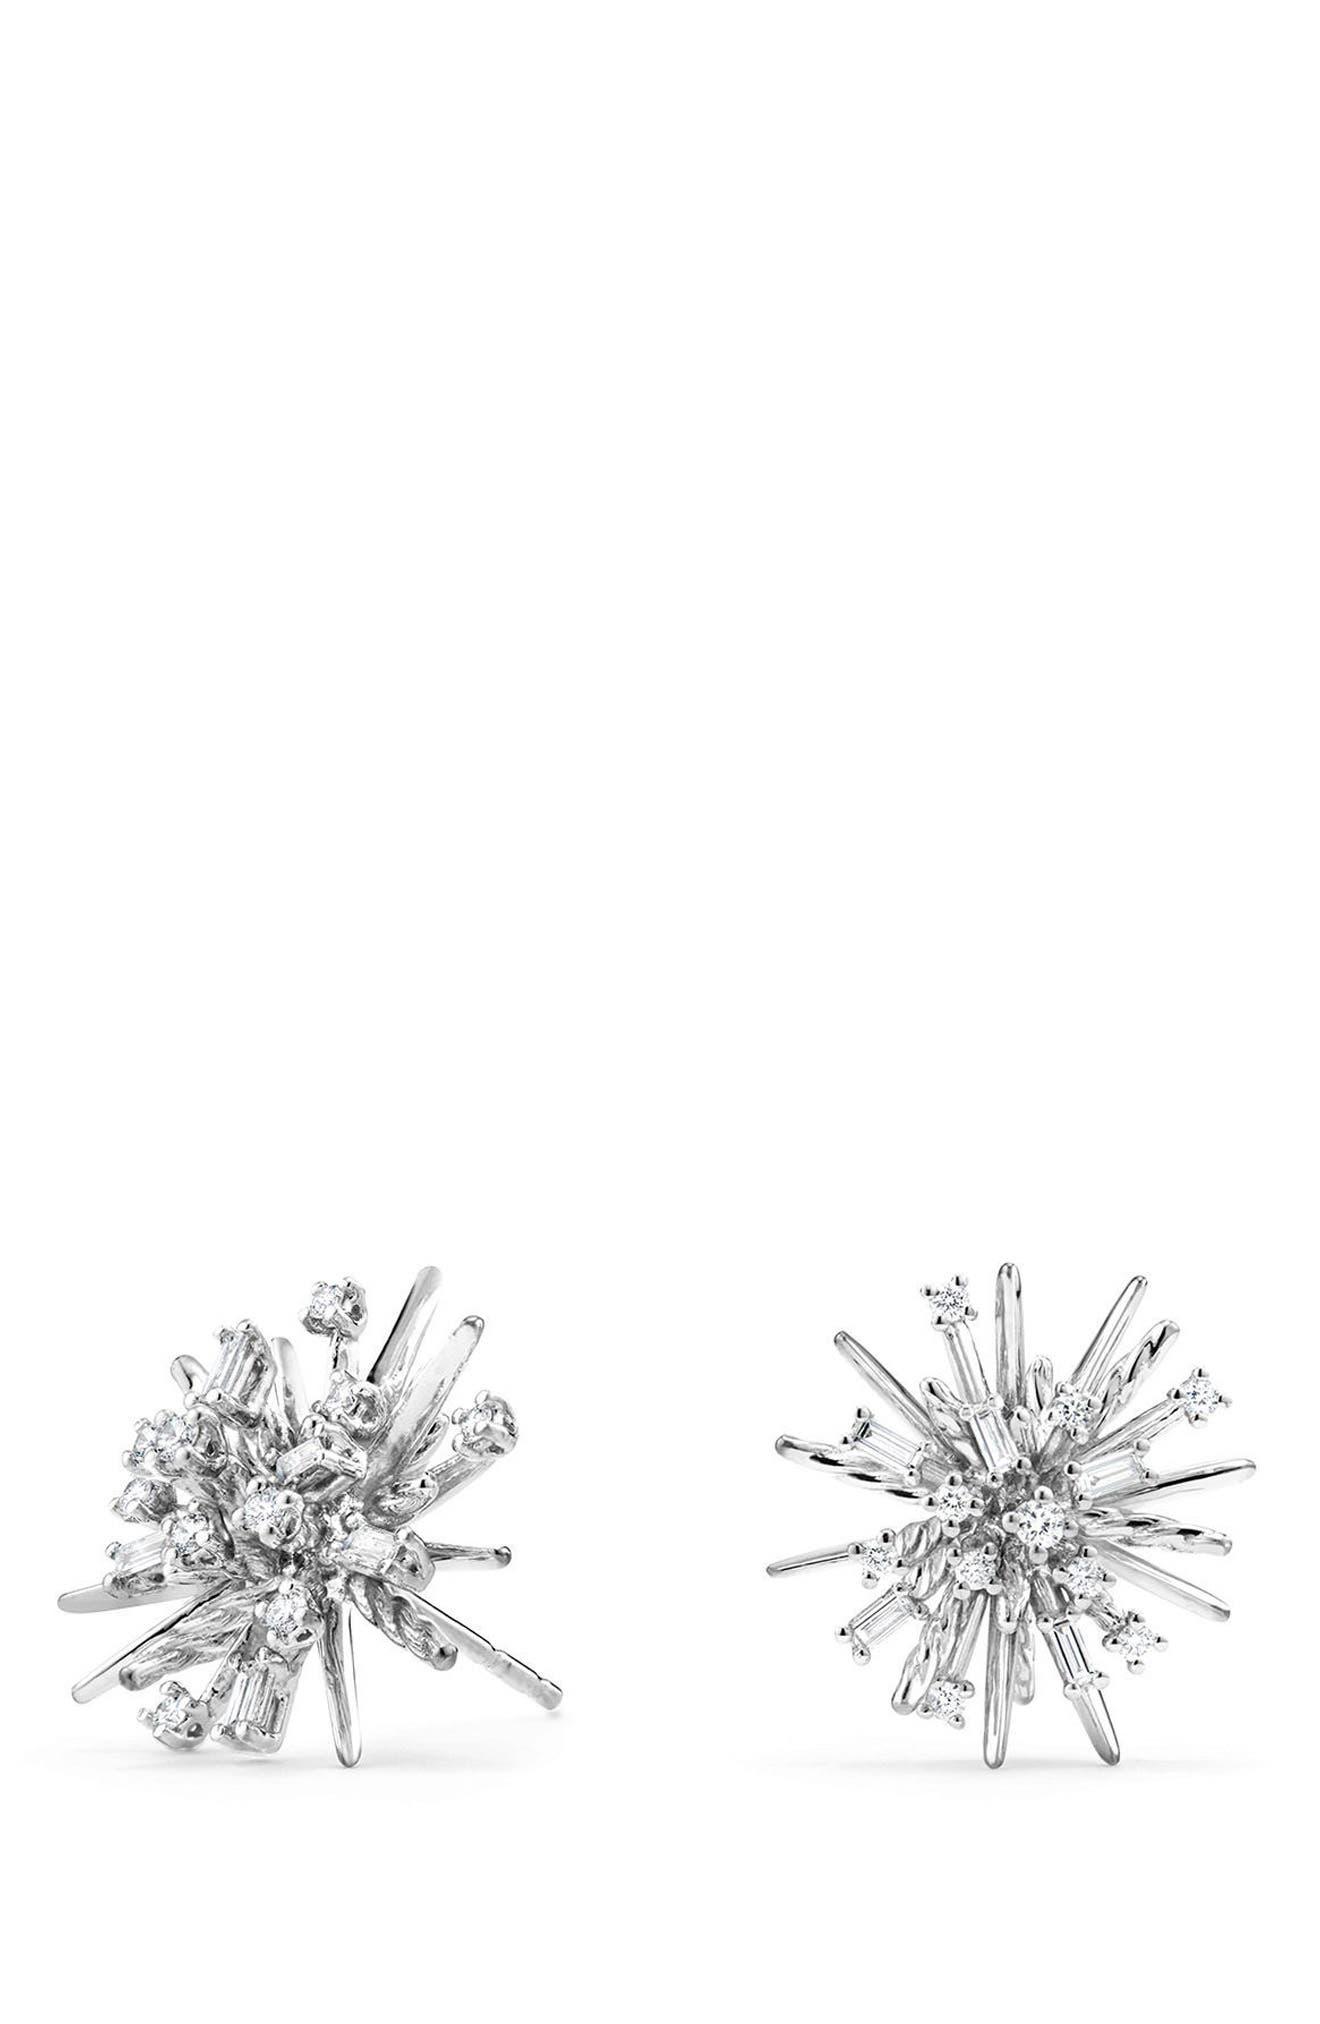 Main Image - David Yurman Supernova Stud Earrings with Diamonds in 18K White Gold